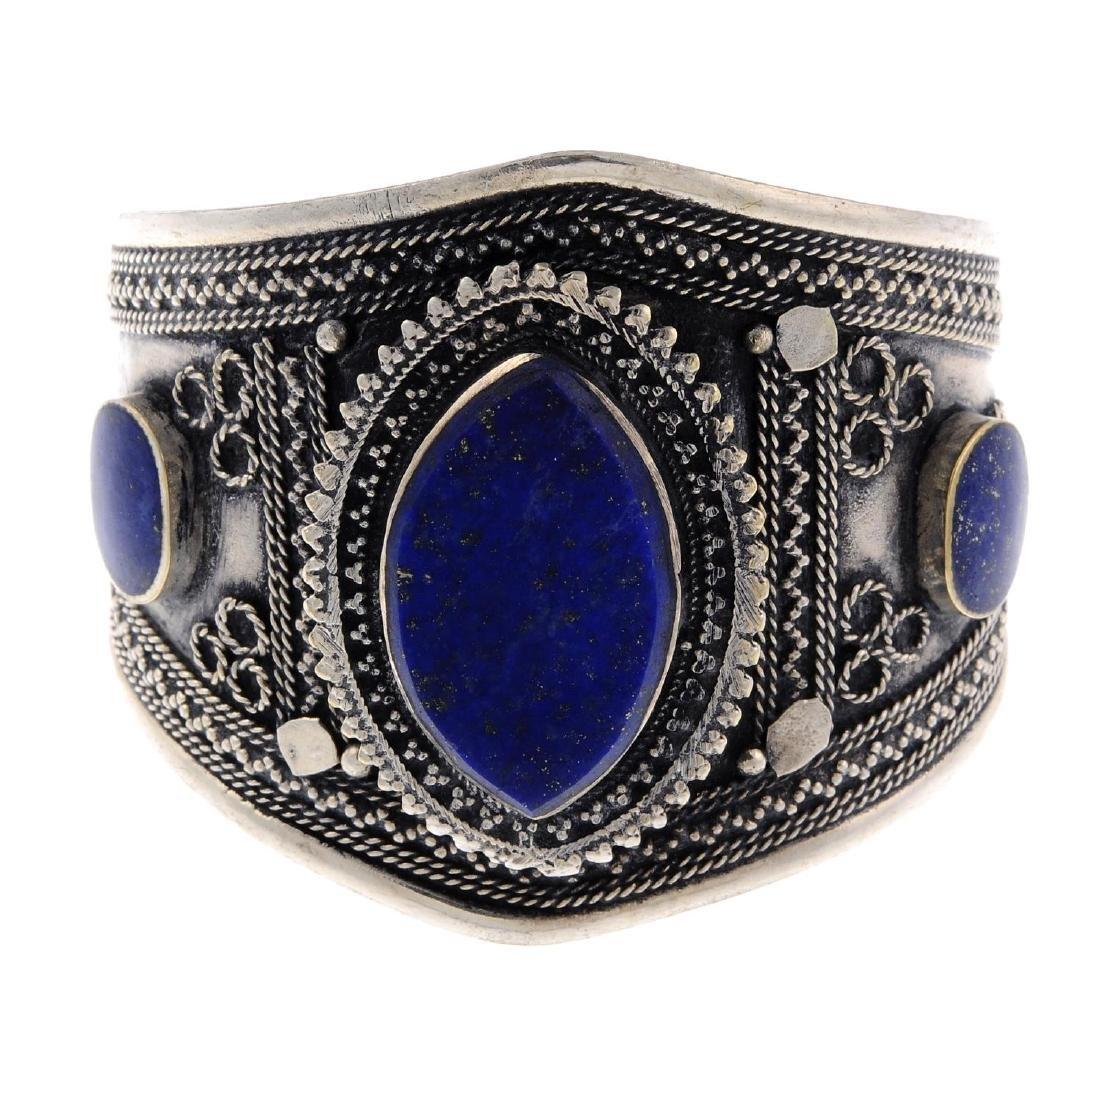 A lapis lazuli bangle. The open bangle of tapered